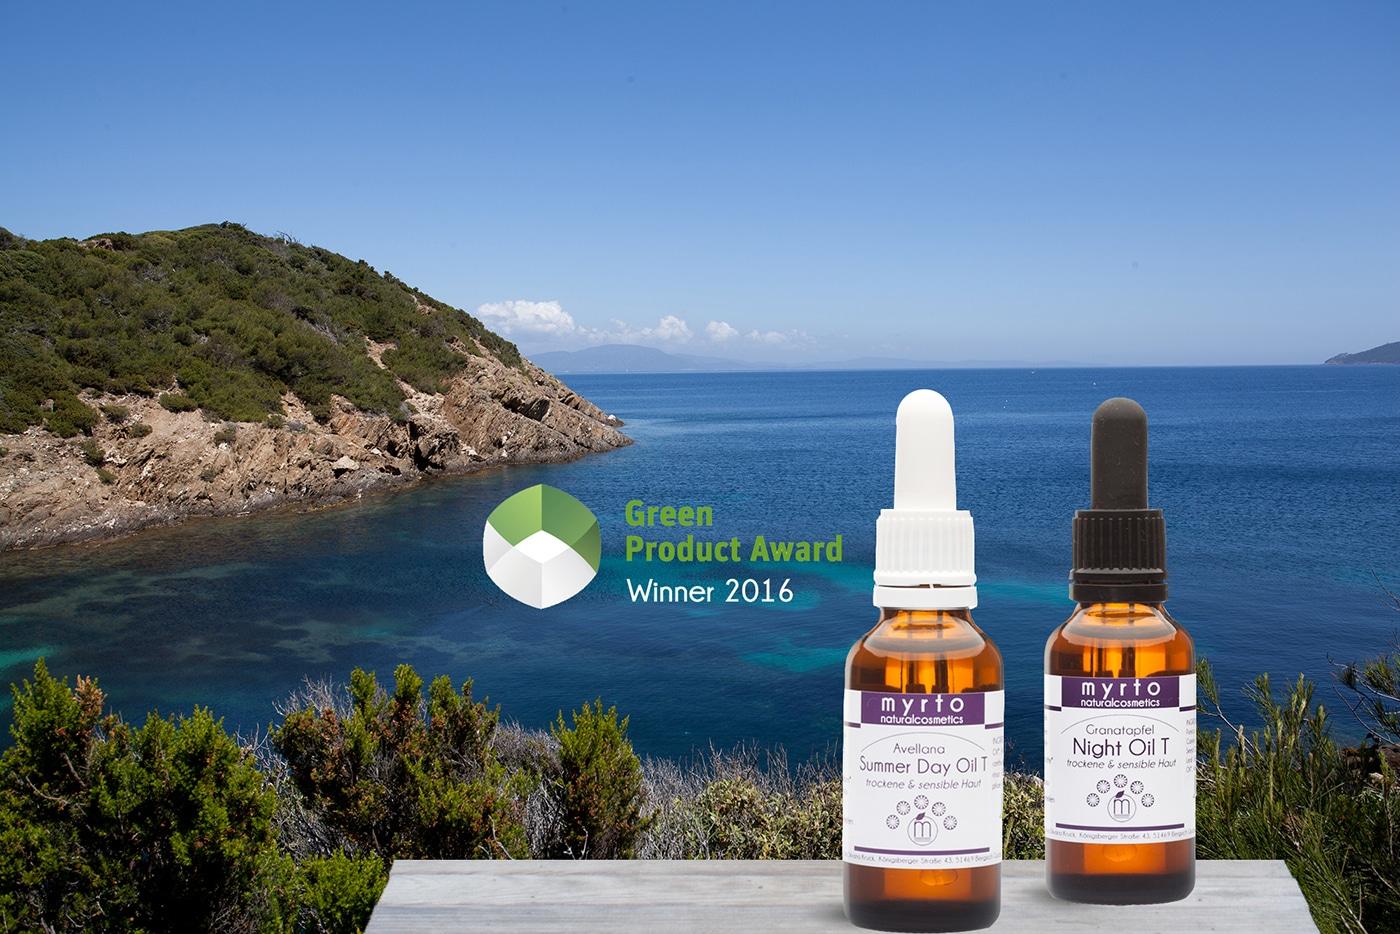 Green Product Award Winner 2016